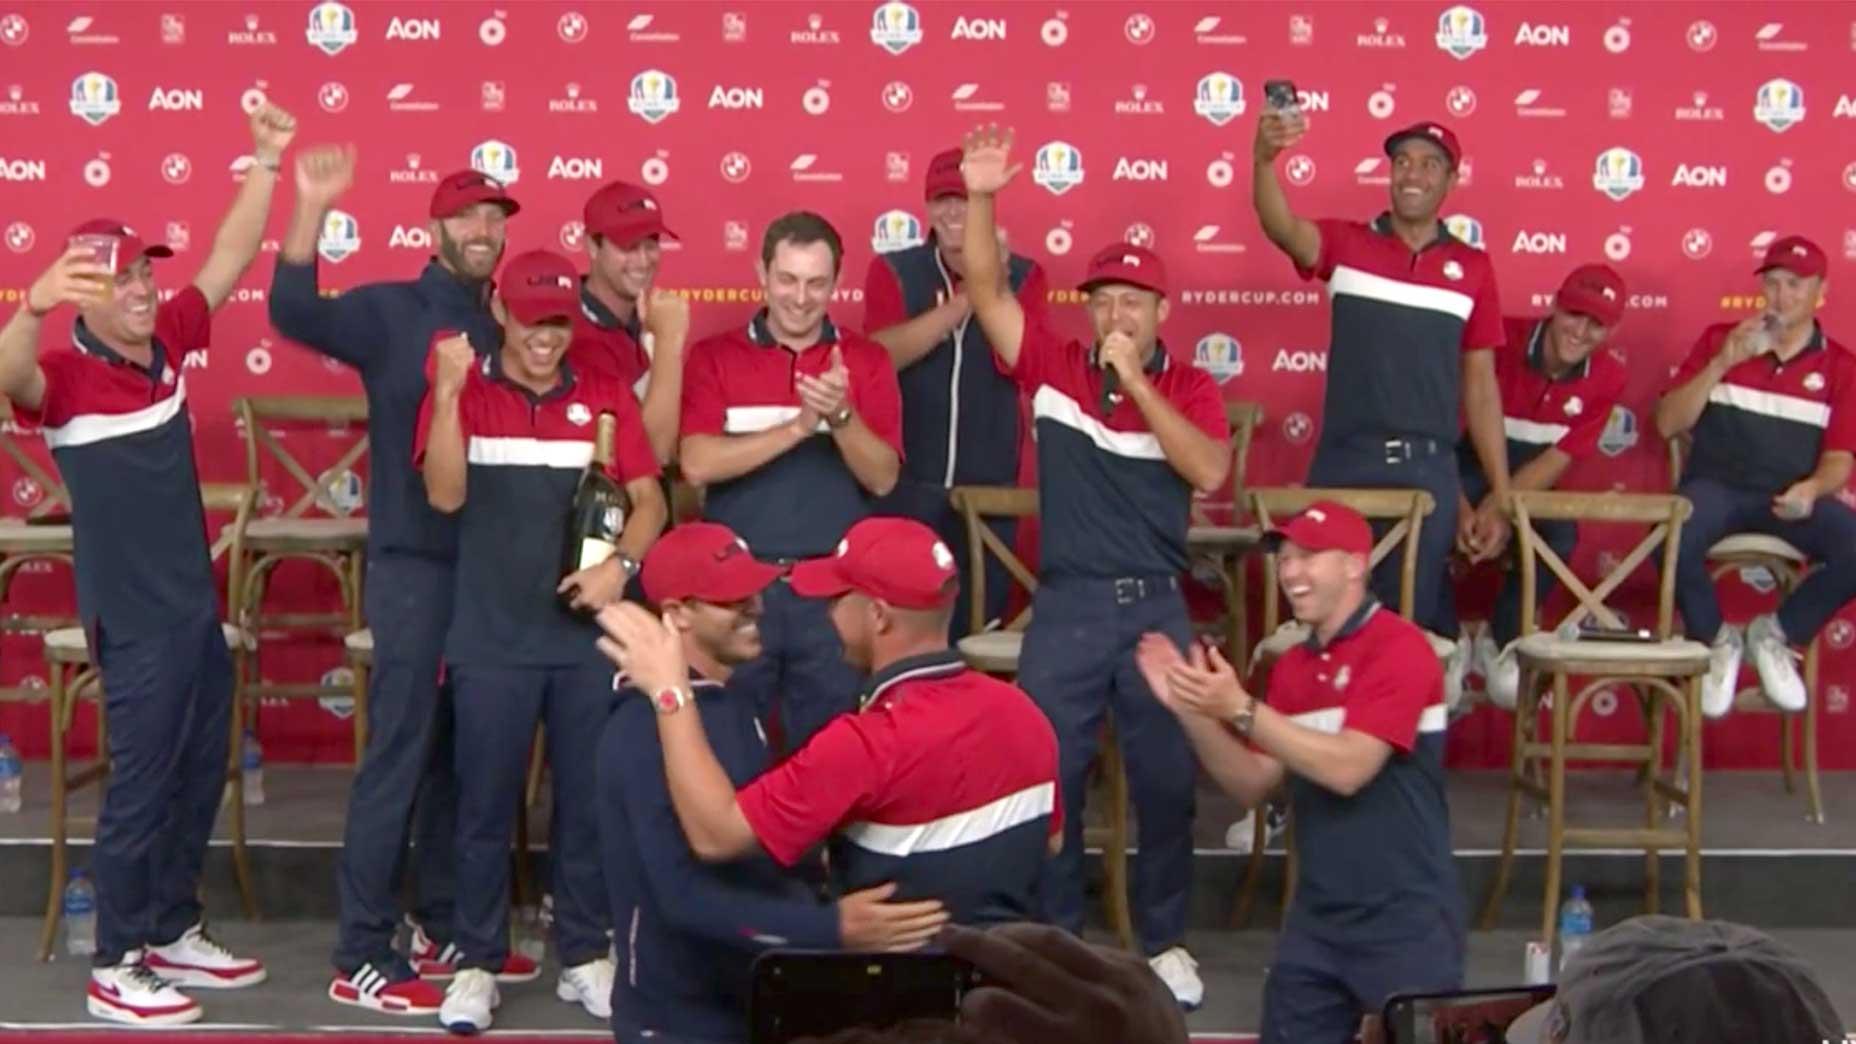 The U.S. Ryder cup team celebrates